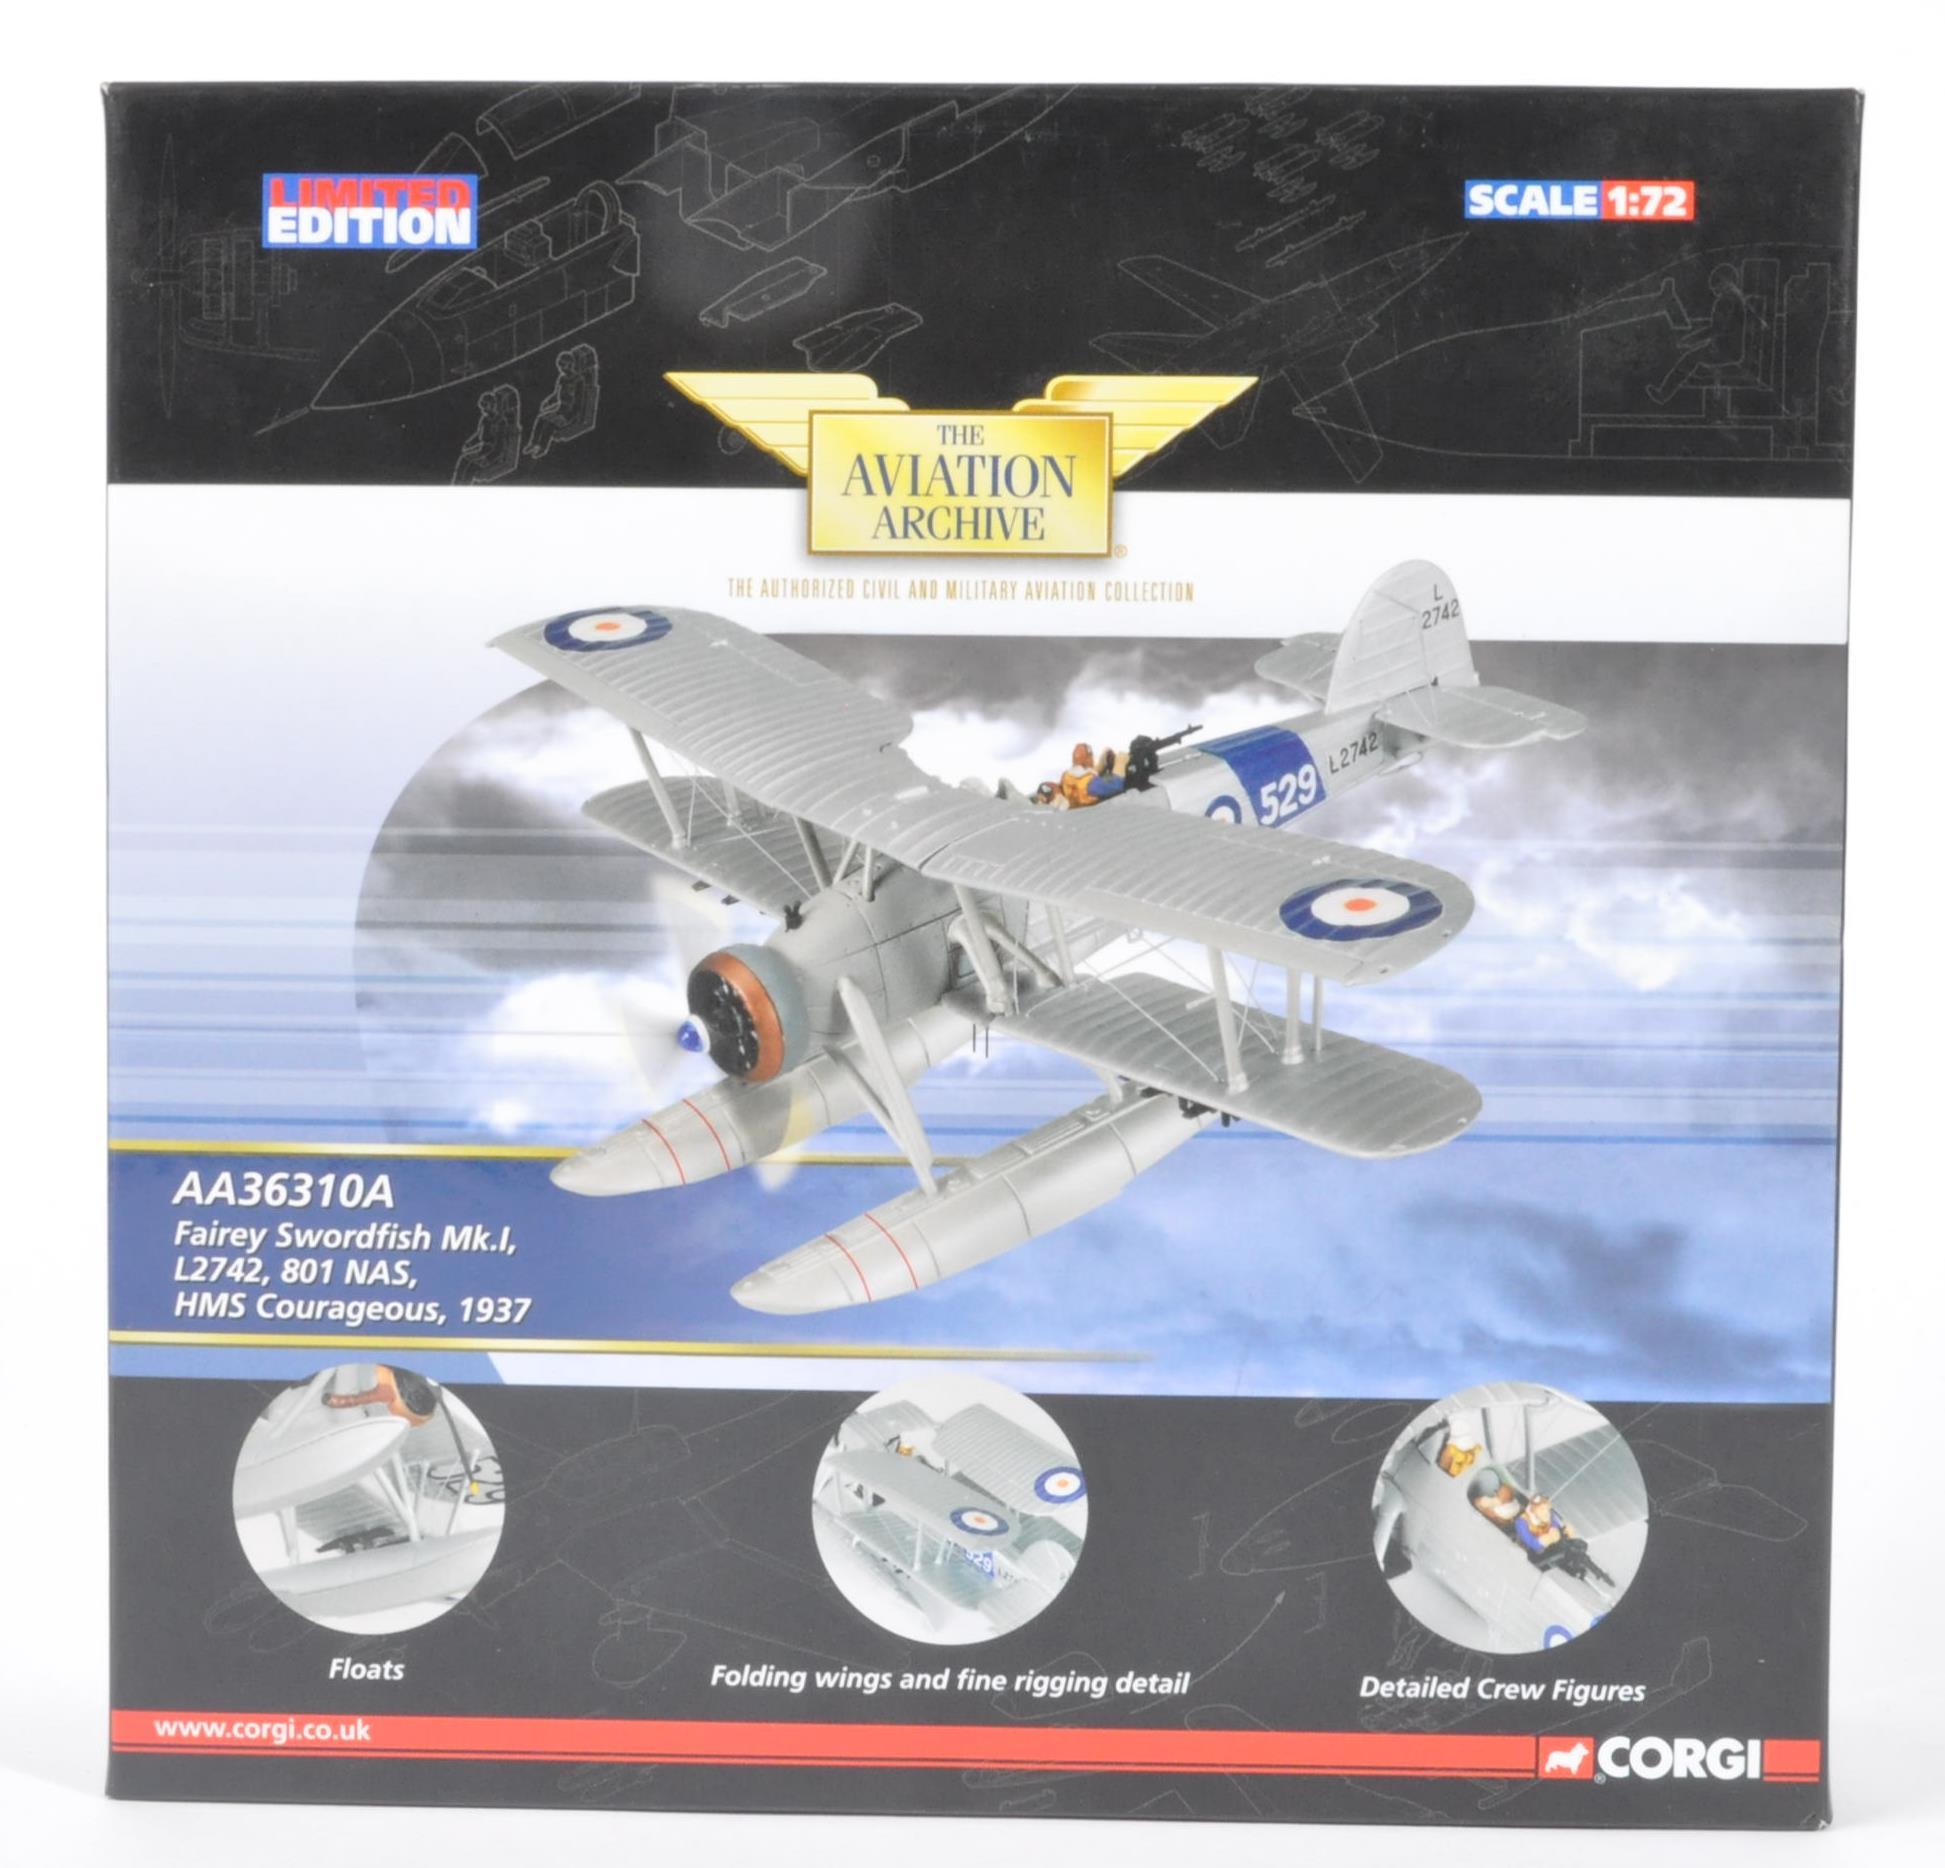 CORGI AVIATION ARCHIVE - AA36310A BOXED DIECAST MODEL PLANE